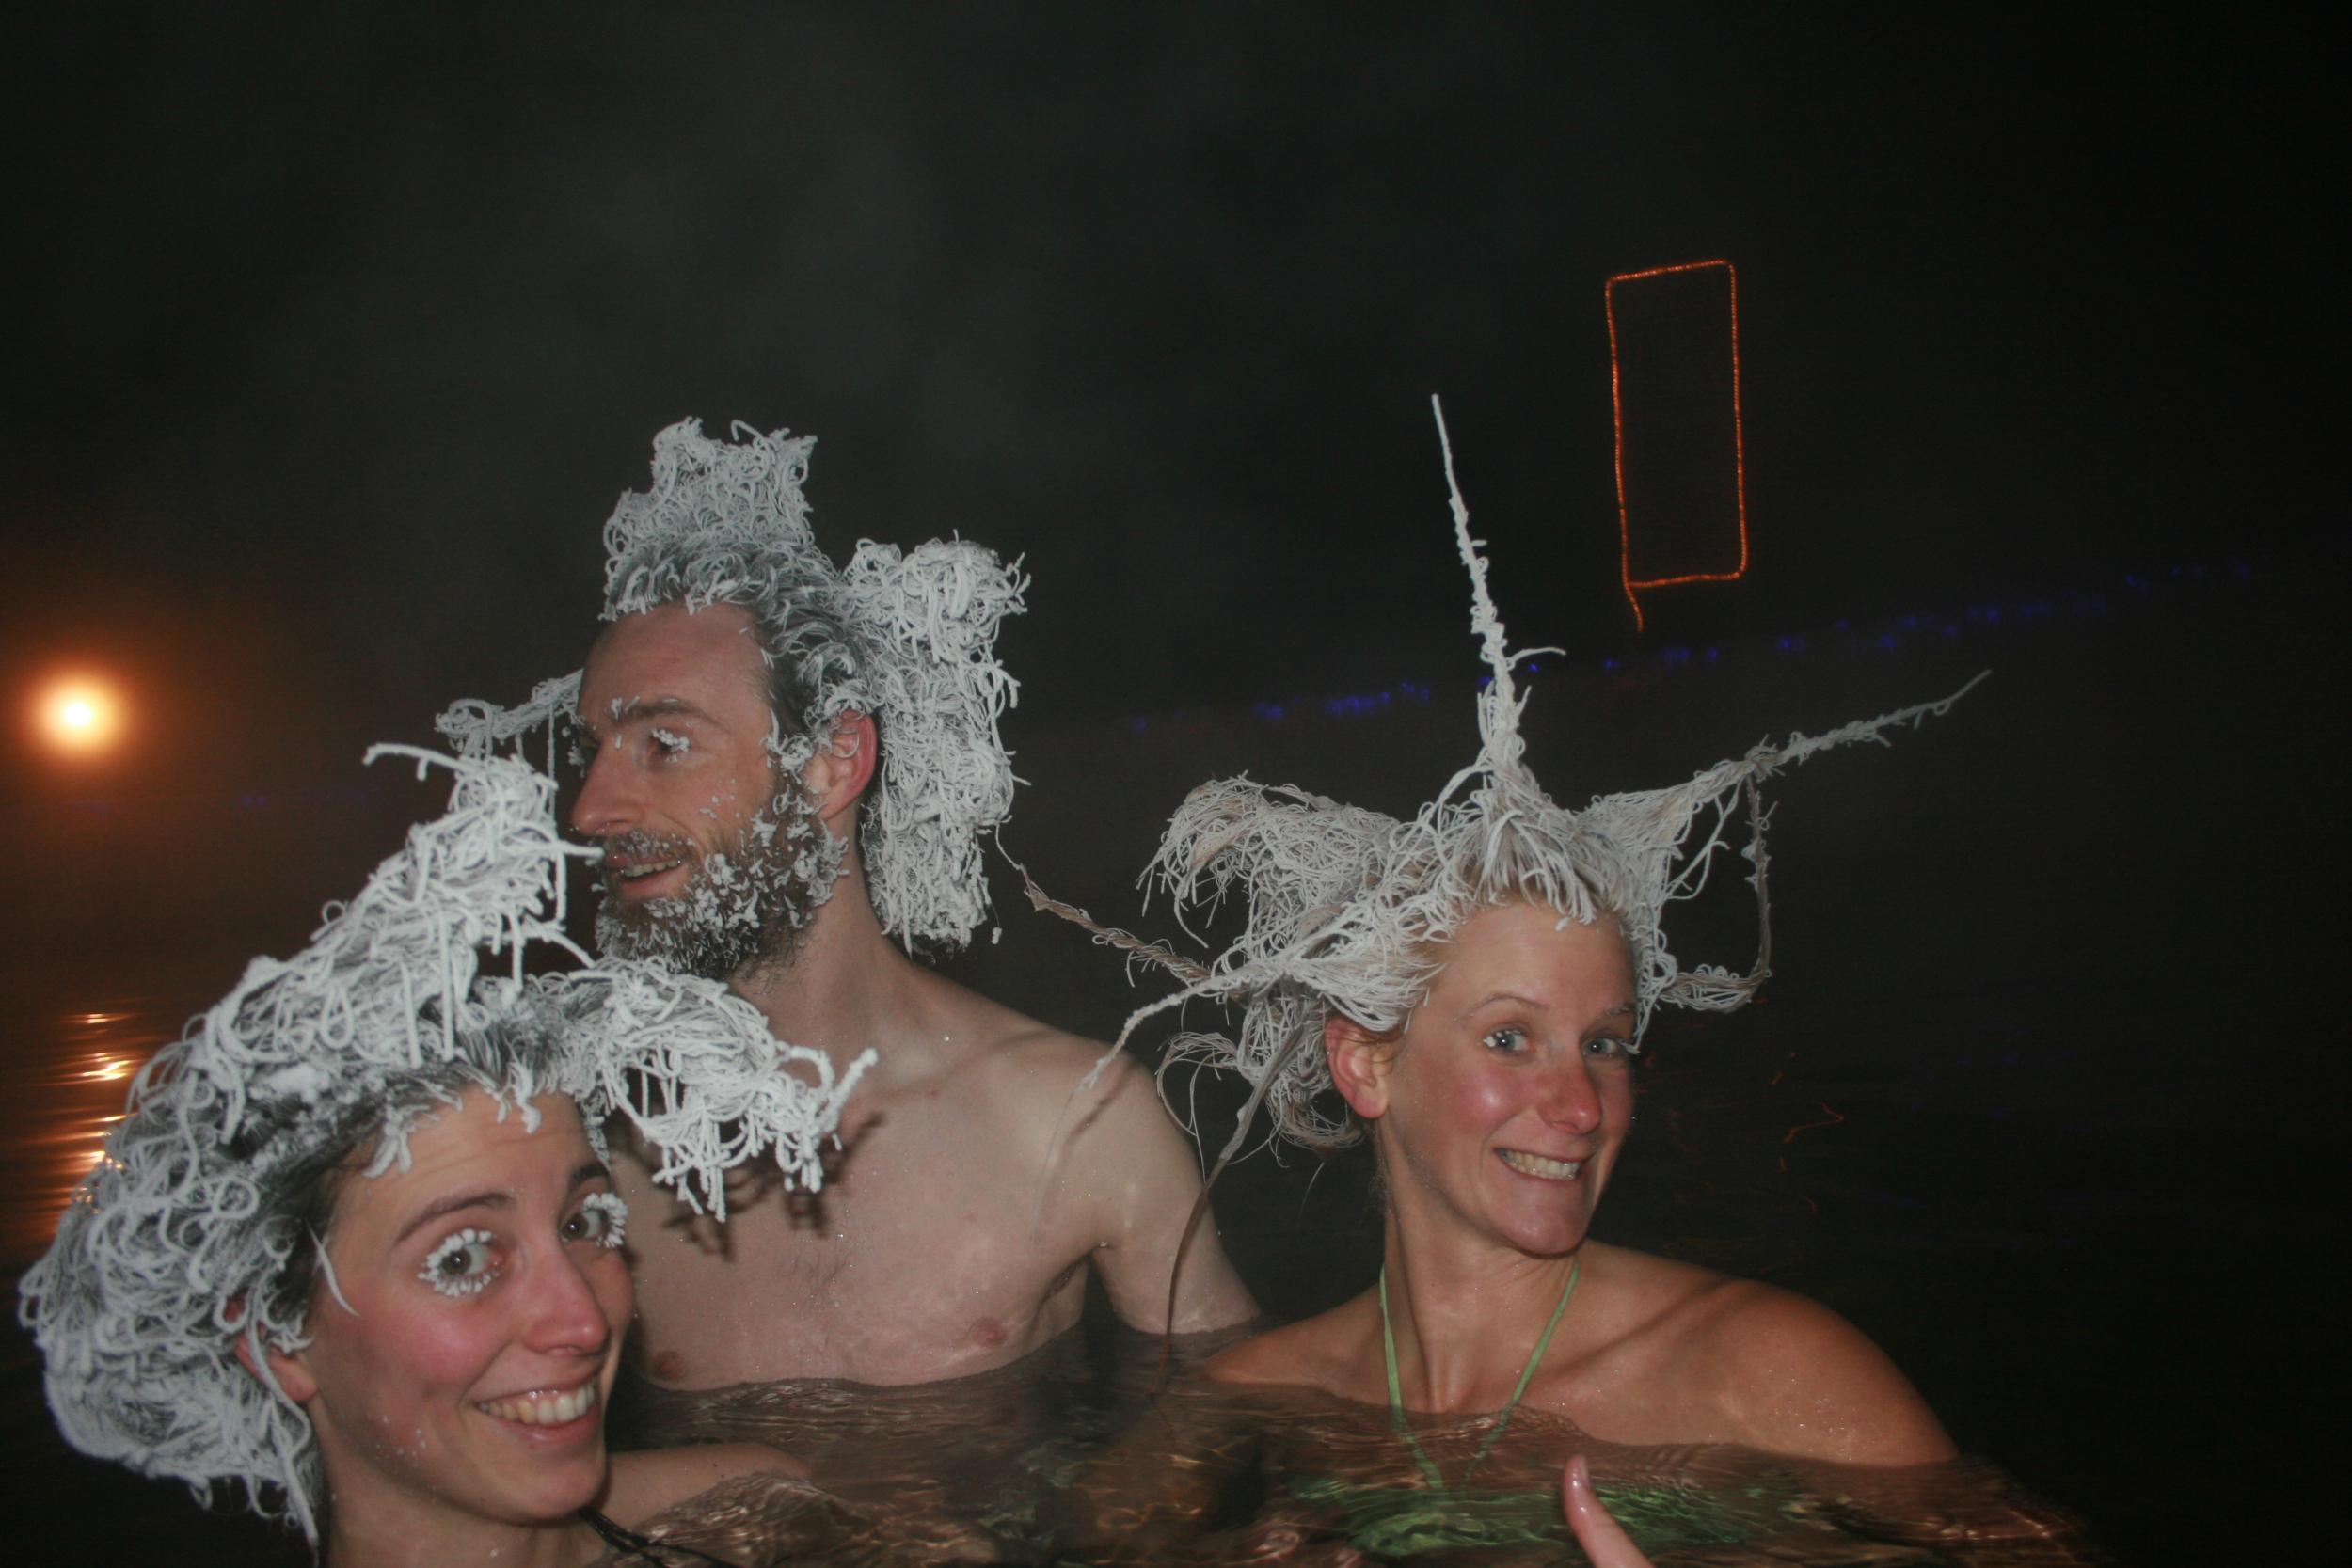 https://static.independent.co.uk/s3fs-public/thumbnails/image/2019/02/13/09/frozen-hair-14.jpg